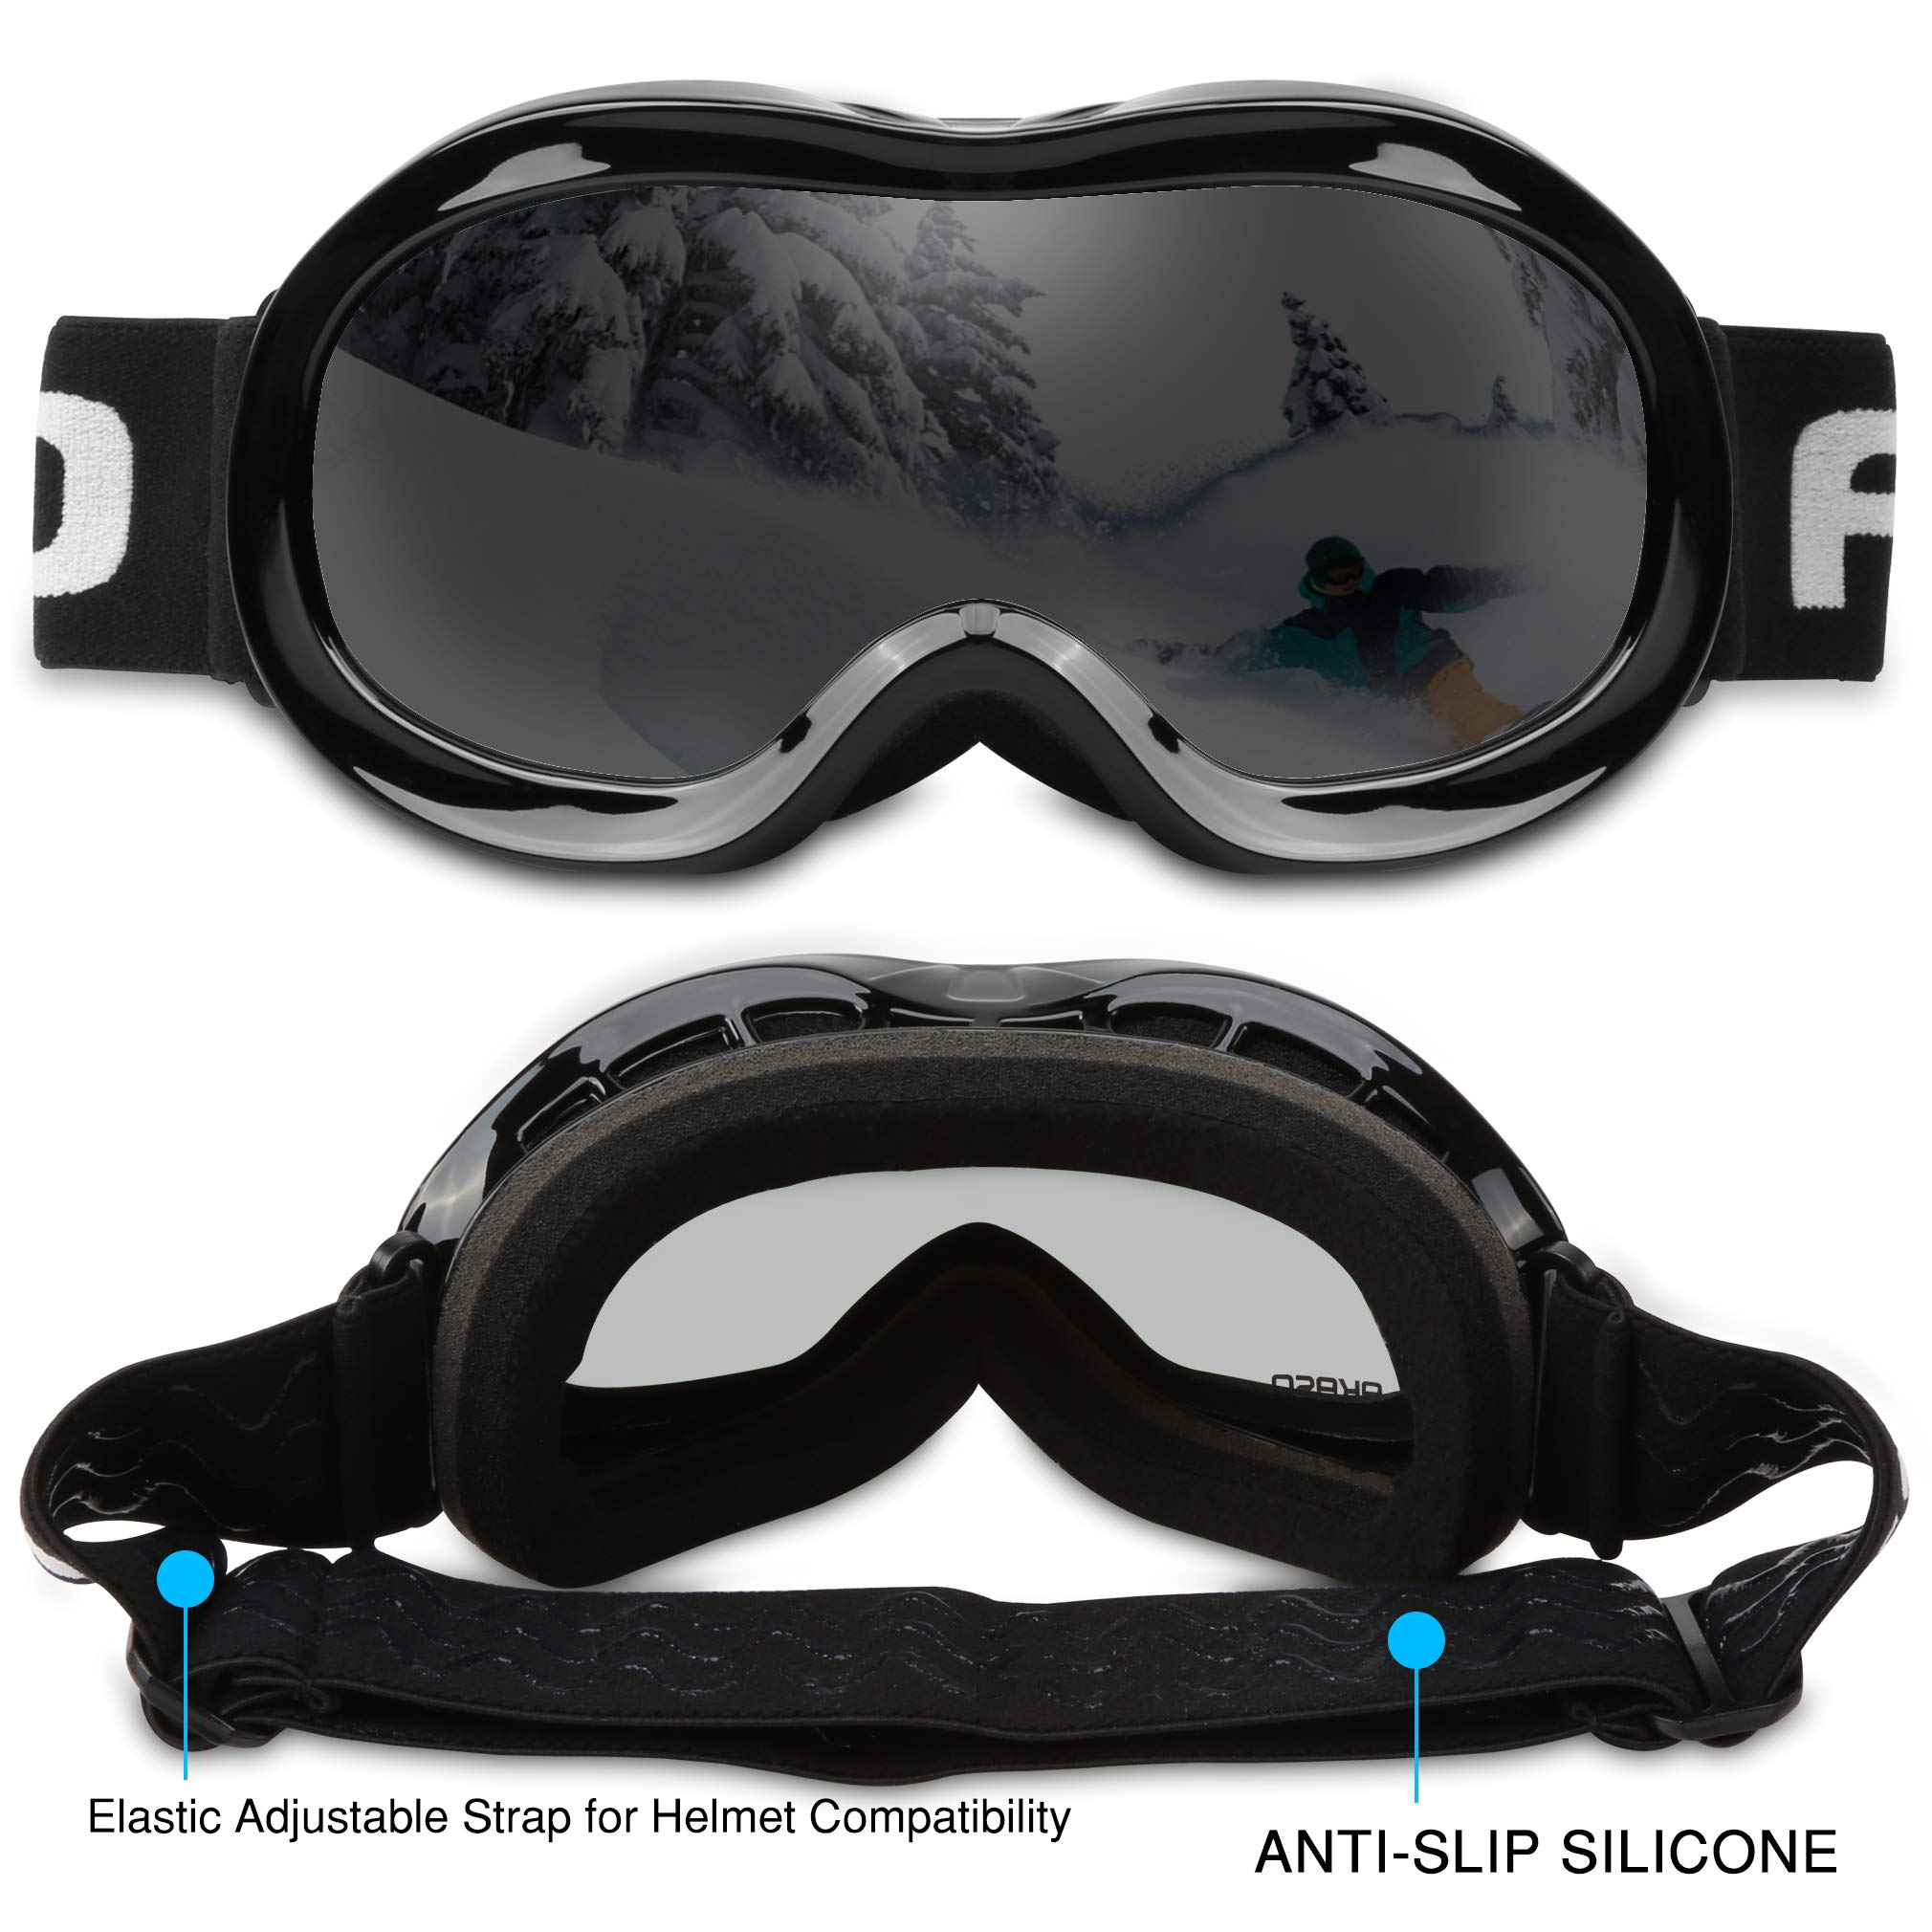 c6f0bce748 SkiShopX › Products